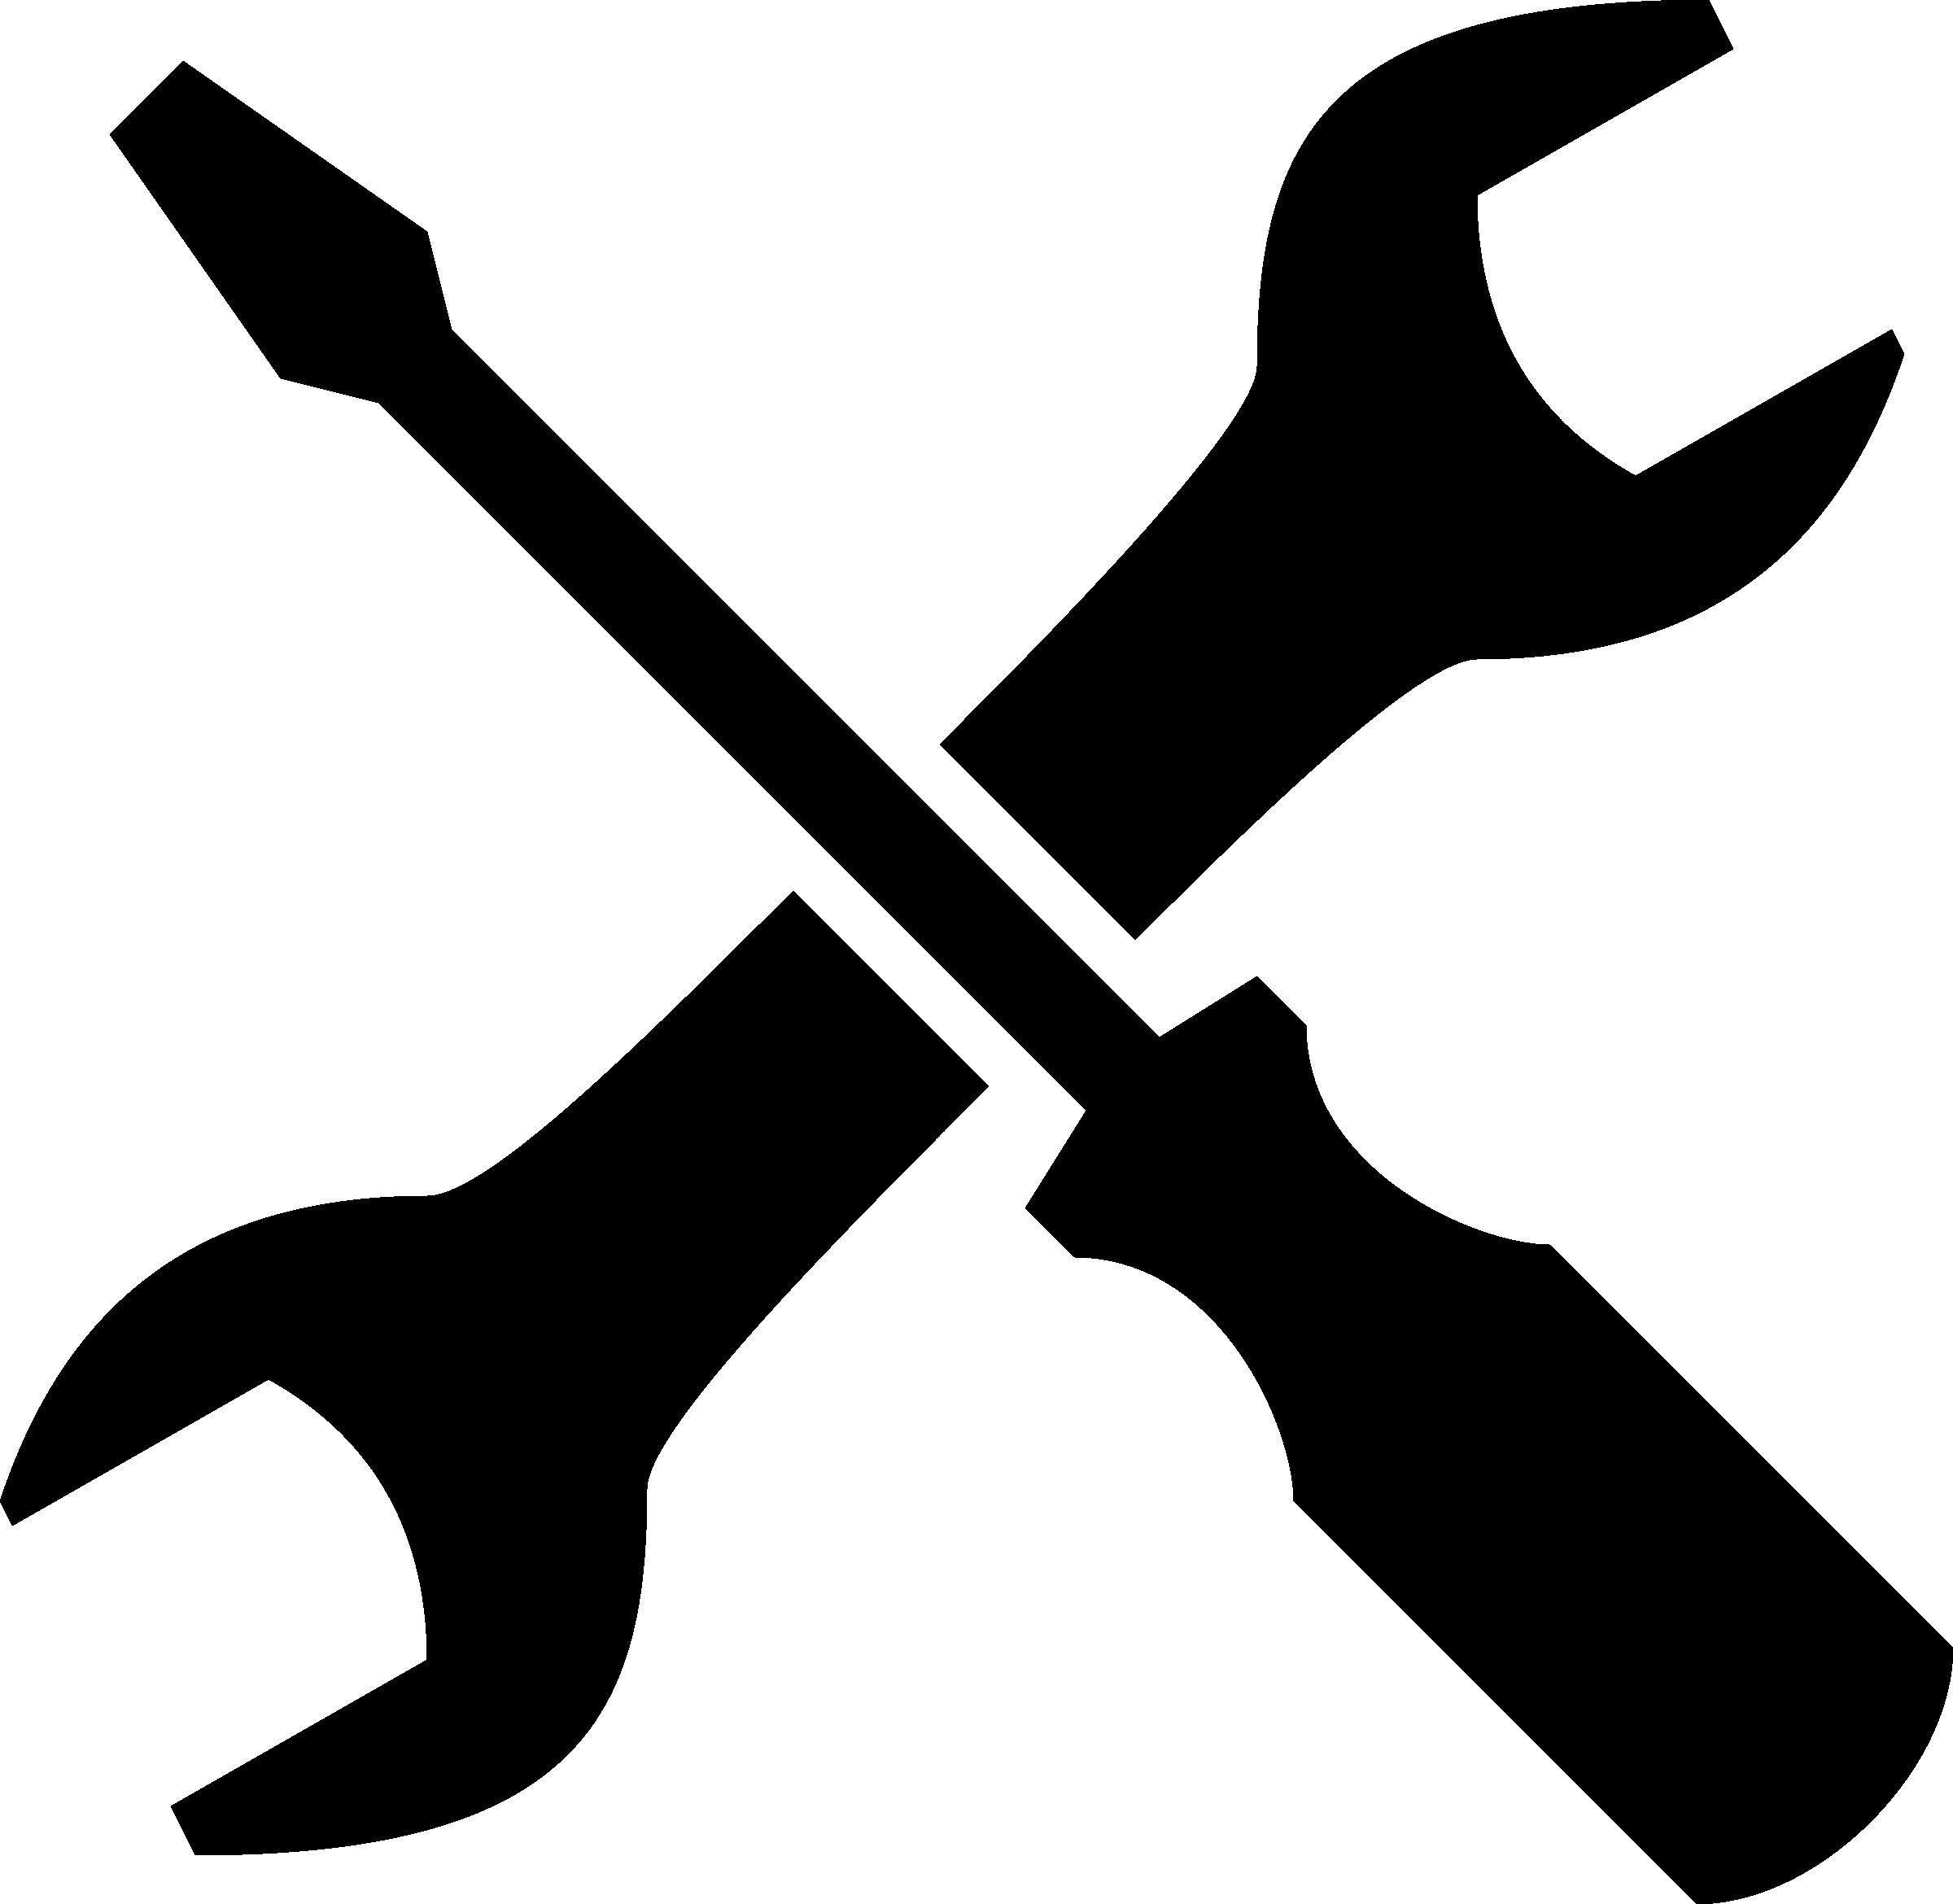 Unique Construction Tools Clip Art Black And White Design » Free.